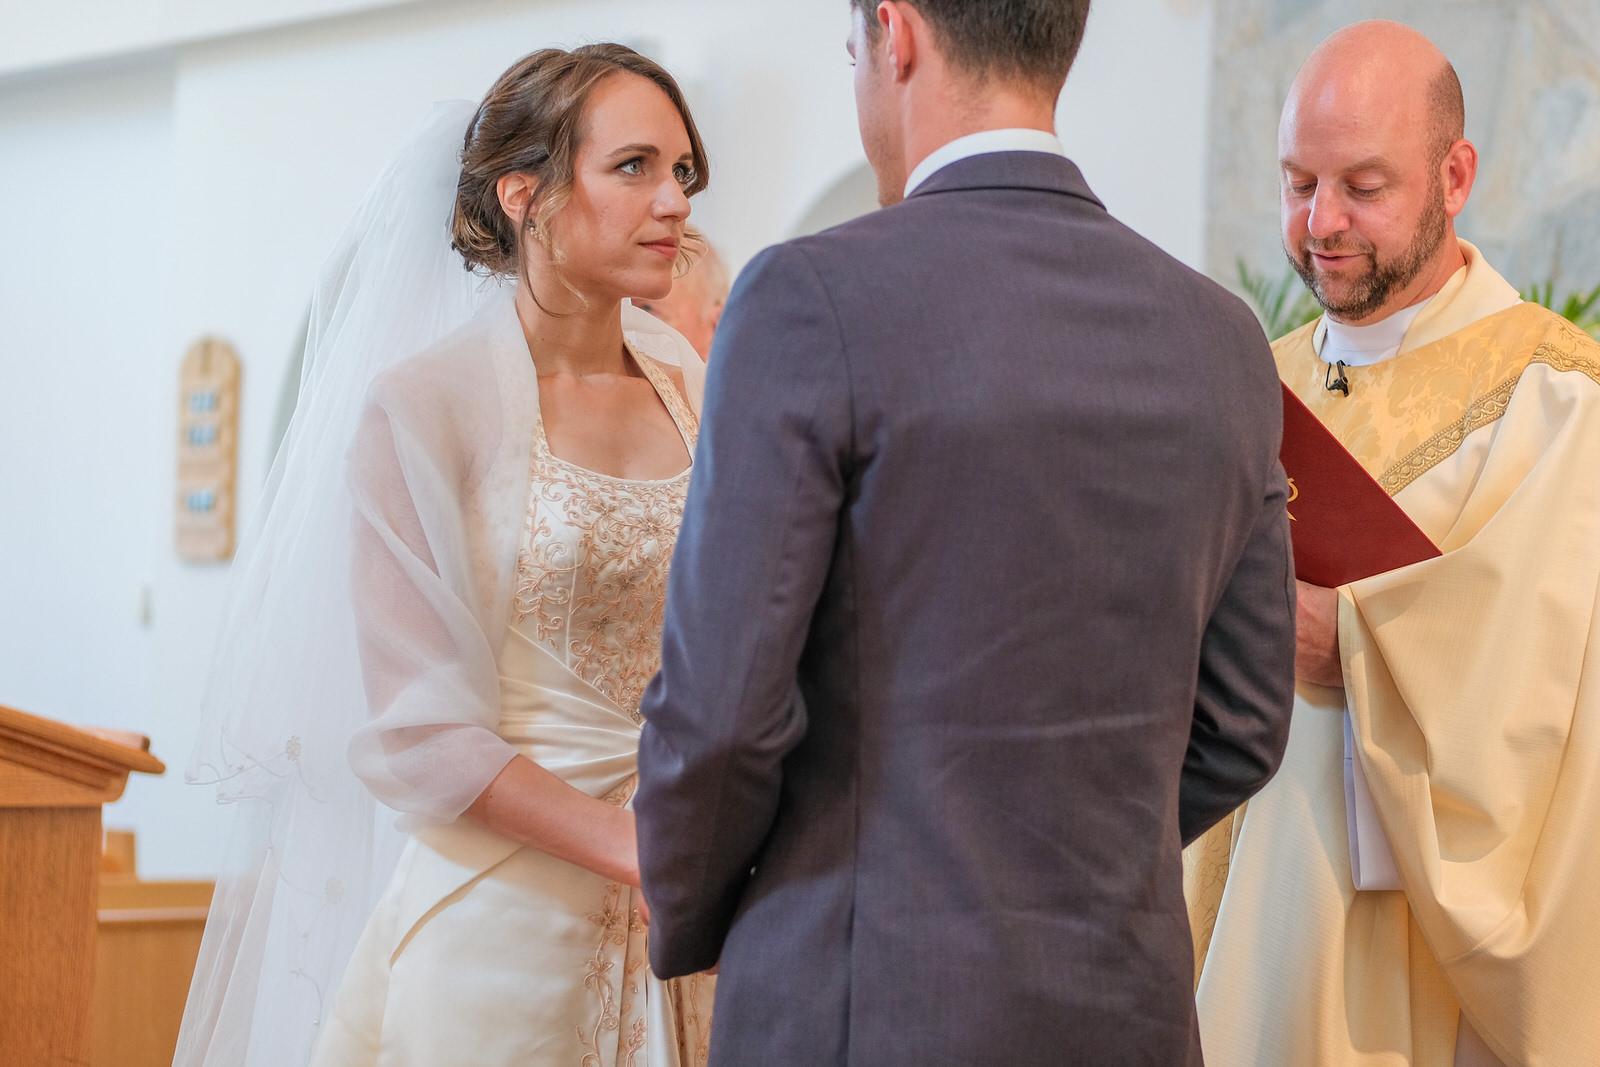 southern-nh-wedding-photography-361-1.jpg